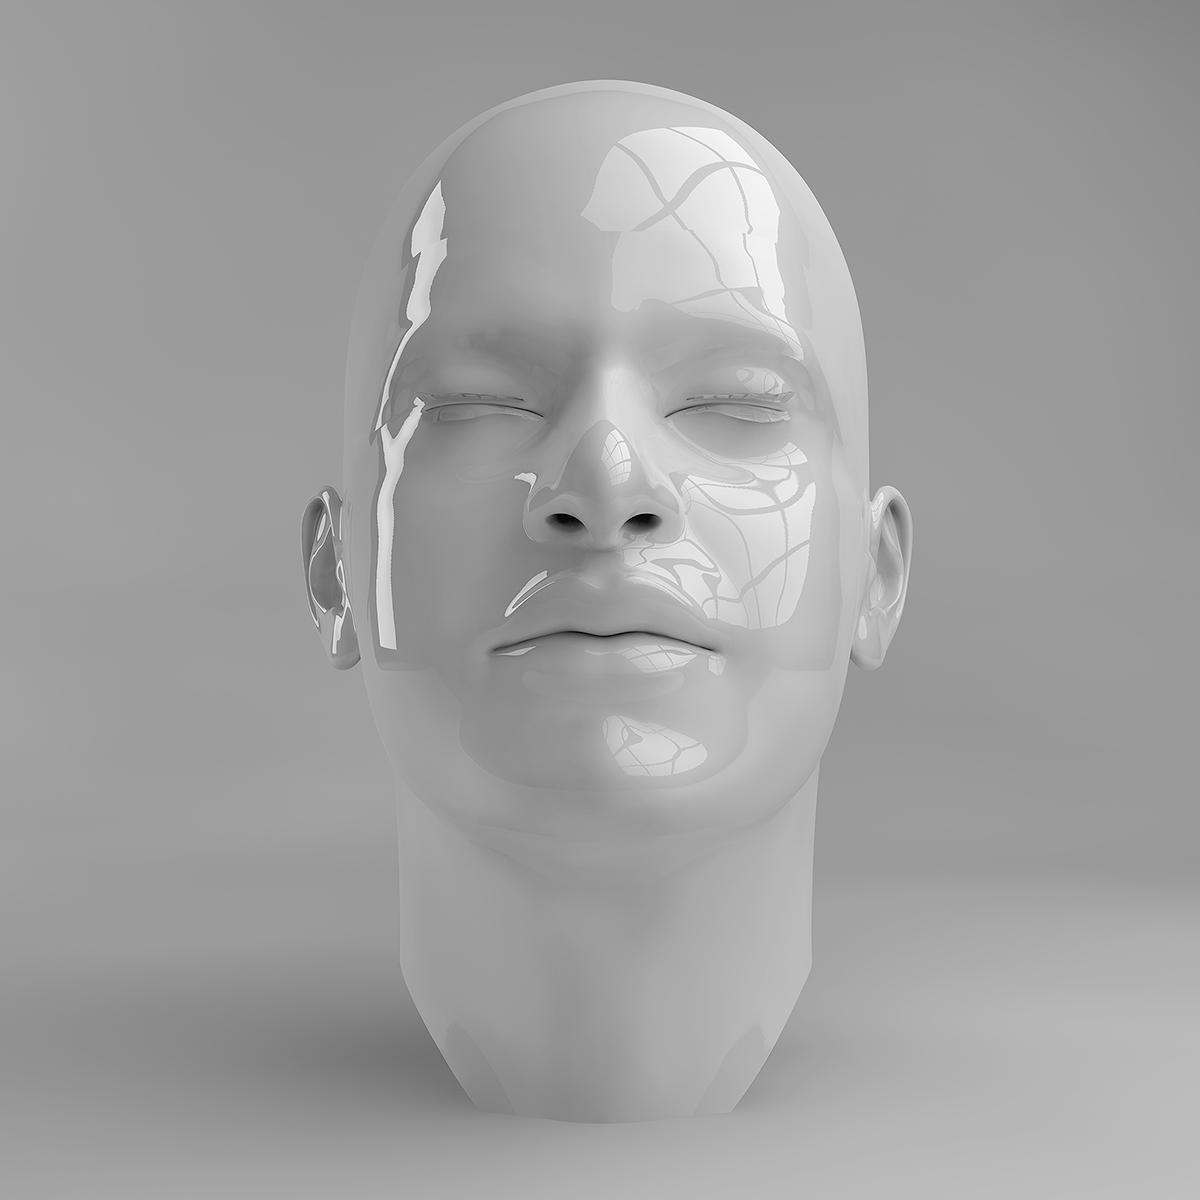 380 2011 eternal heads 004 resume high tty art - Resume - High Definition